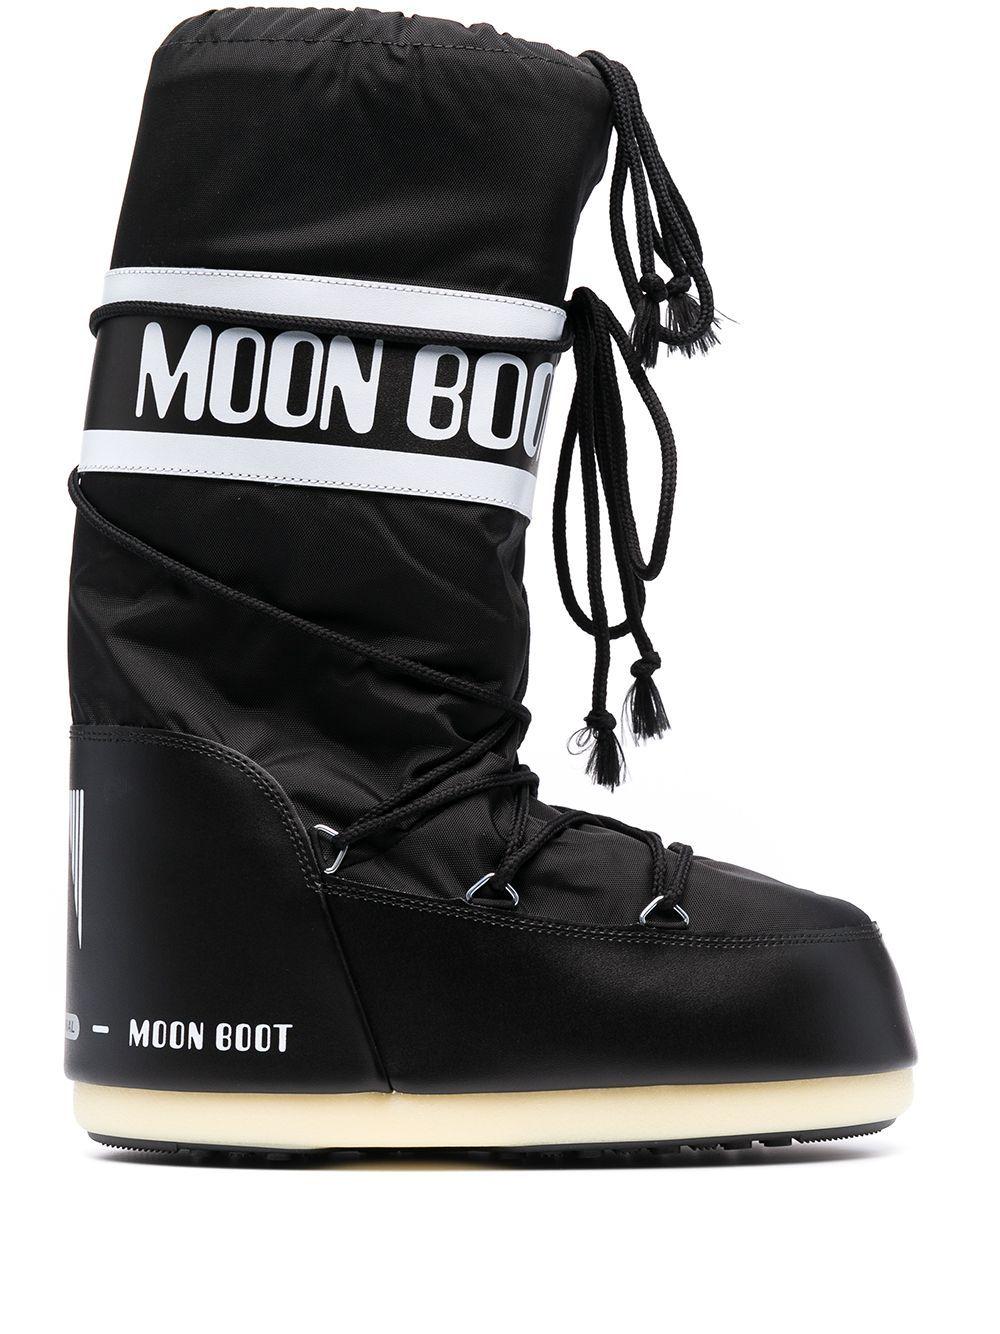 Moon boot in nylon